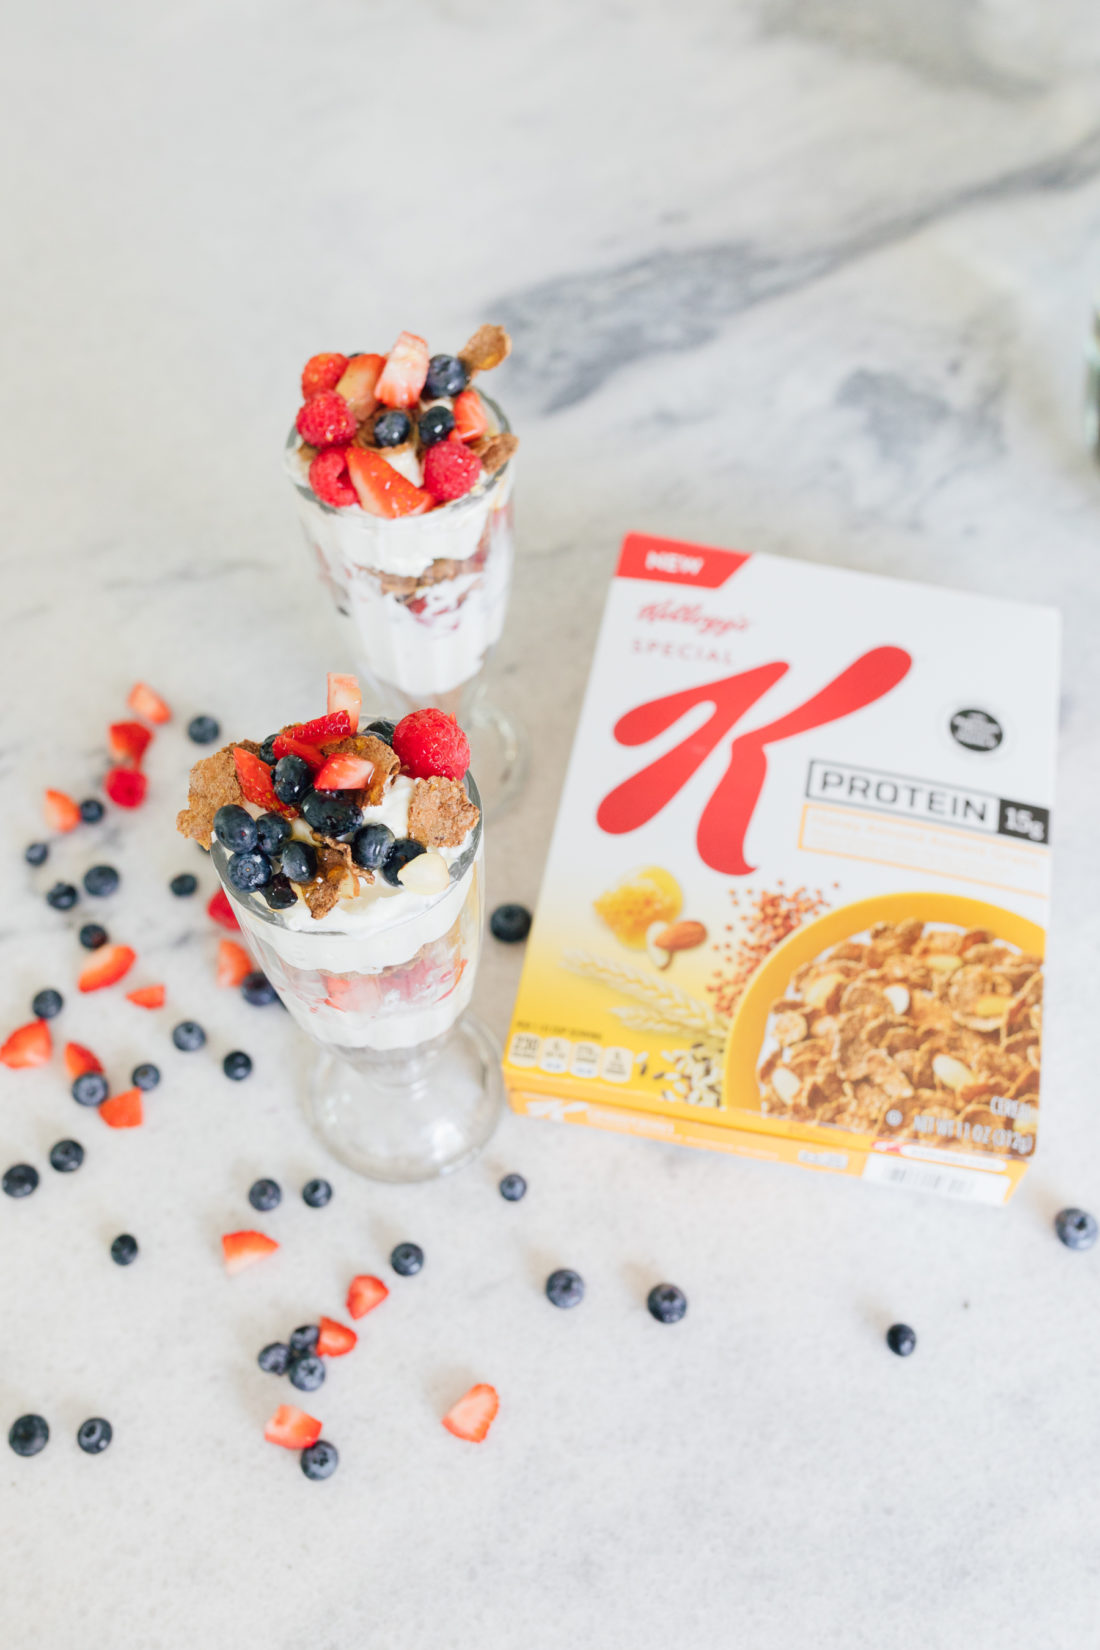 Eva Amurri Martino of Happily Eva After shares her yogurt parfait recipe